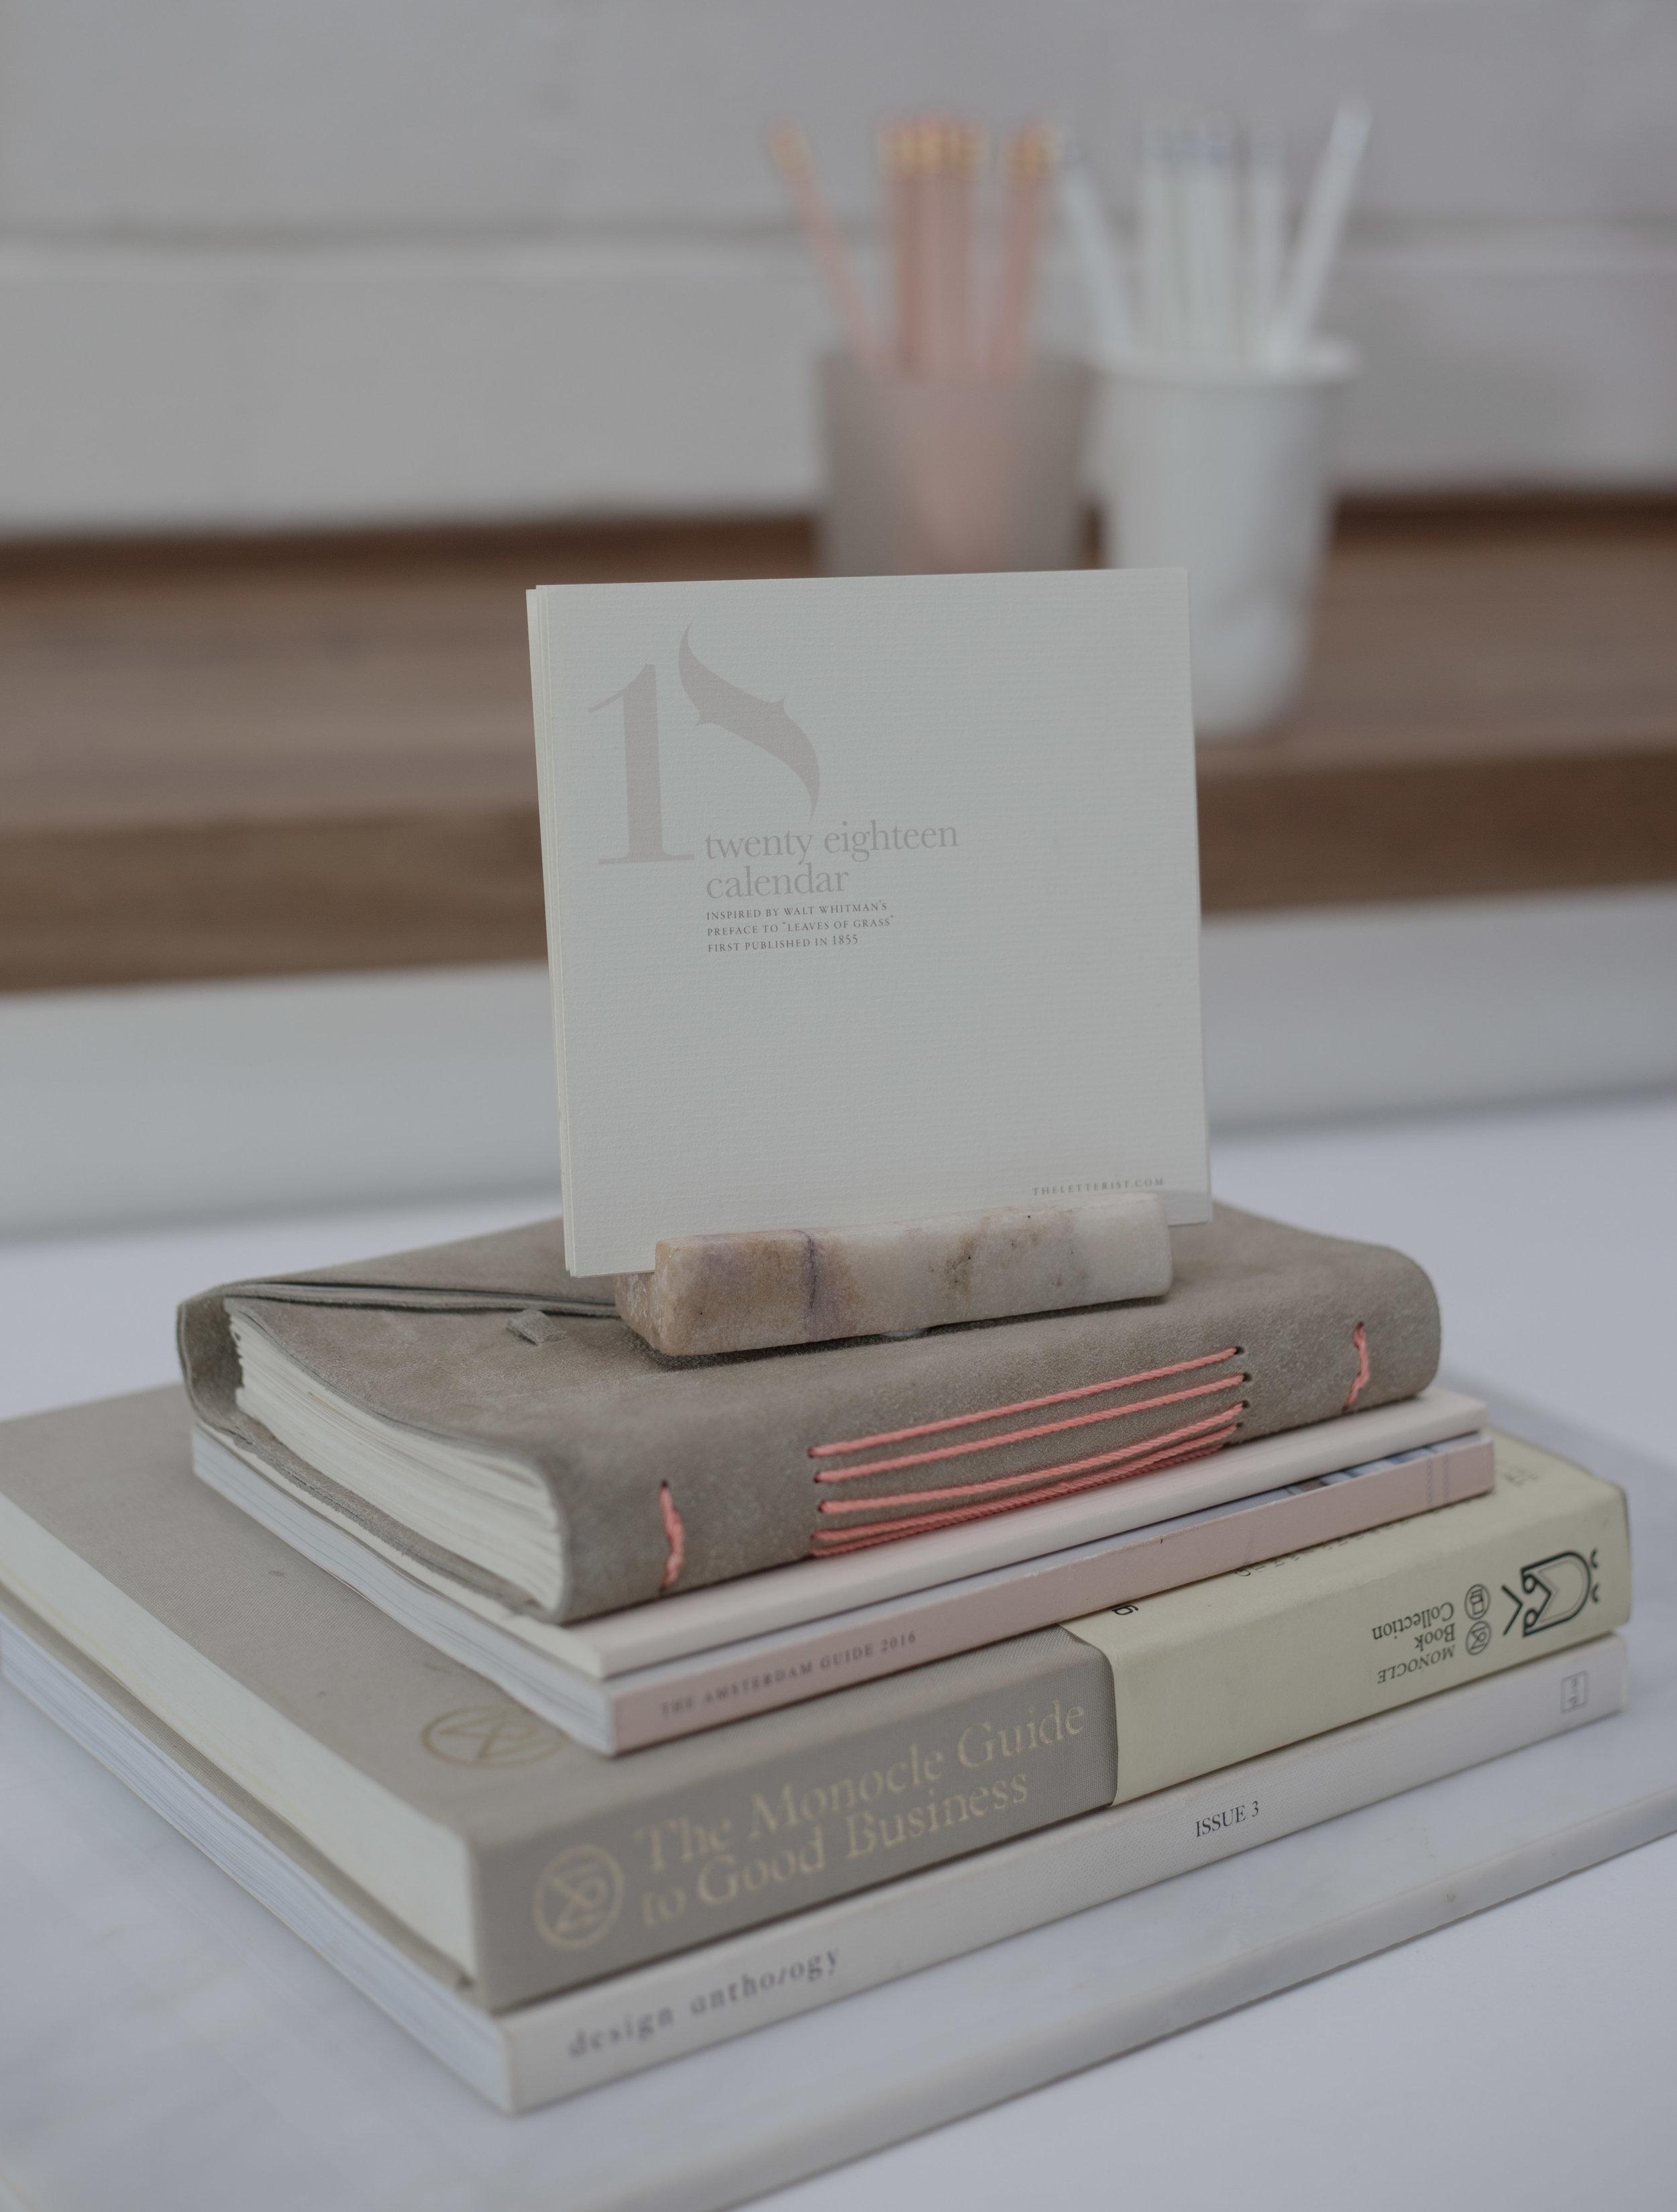 desk-calendar-pinks2.jpg